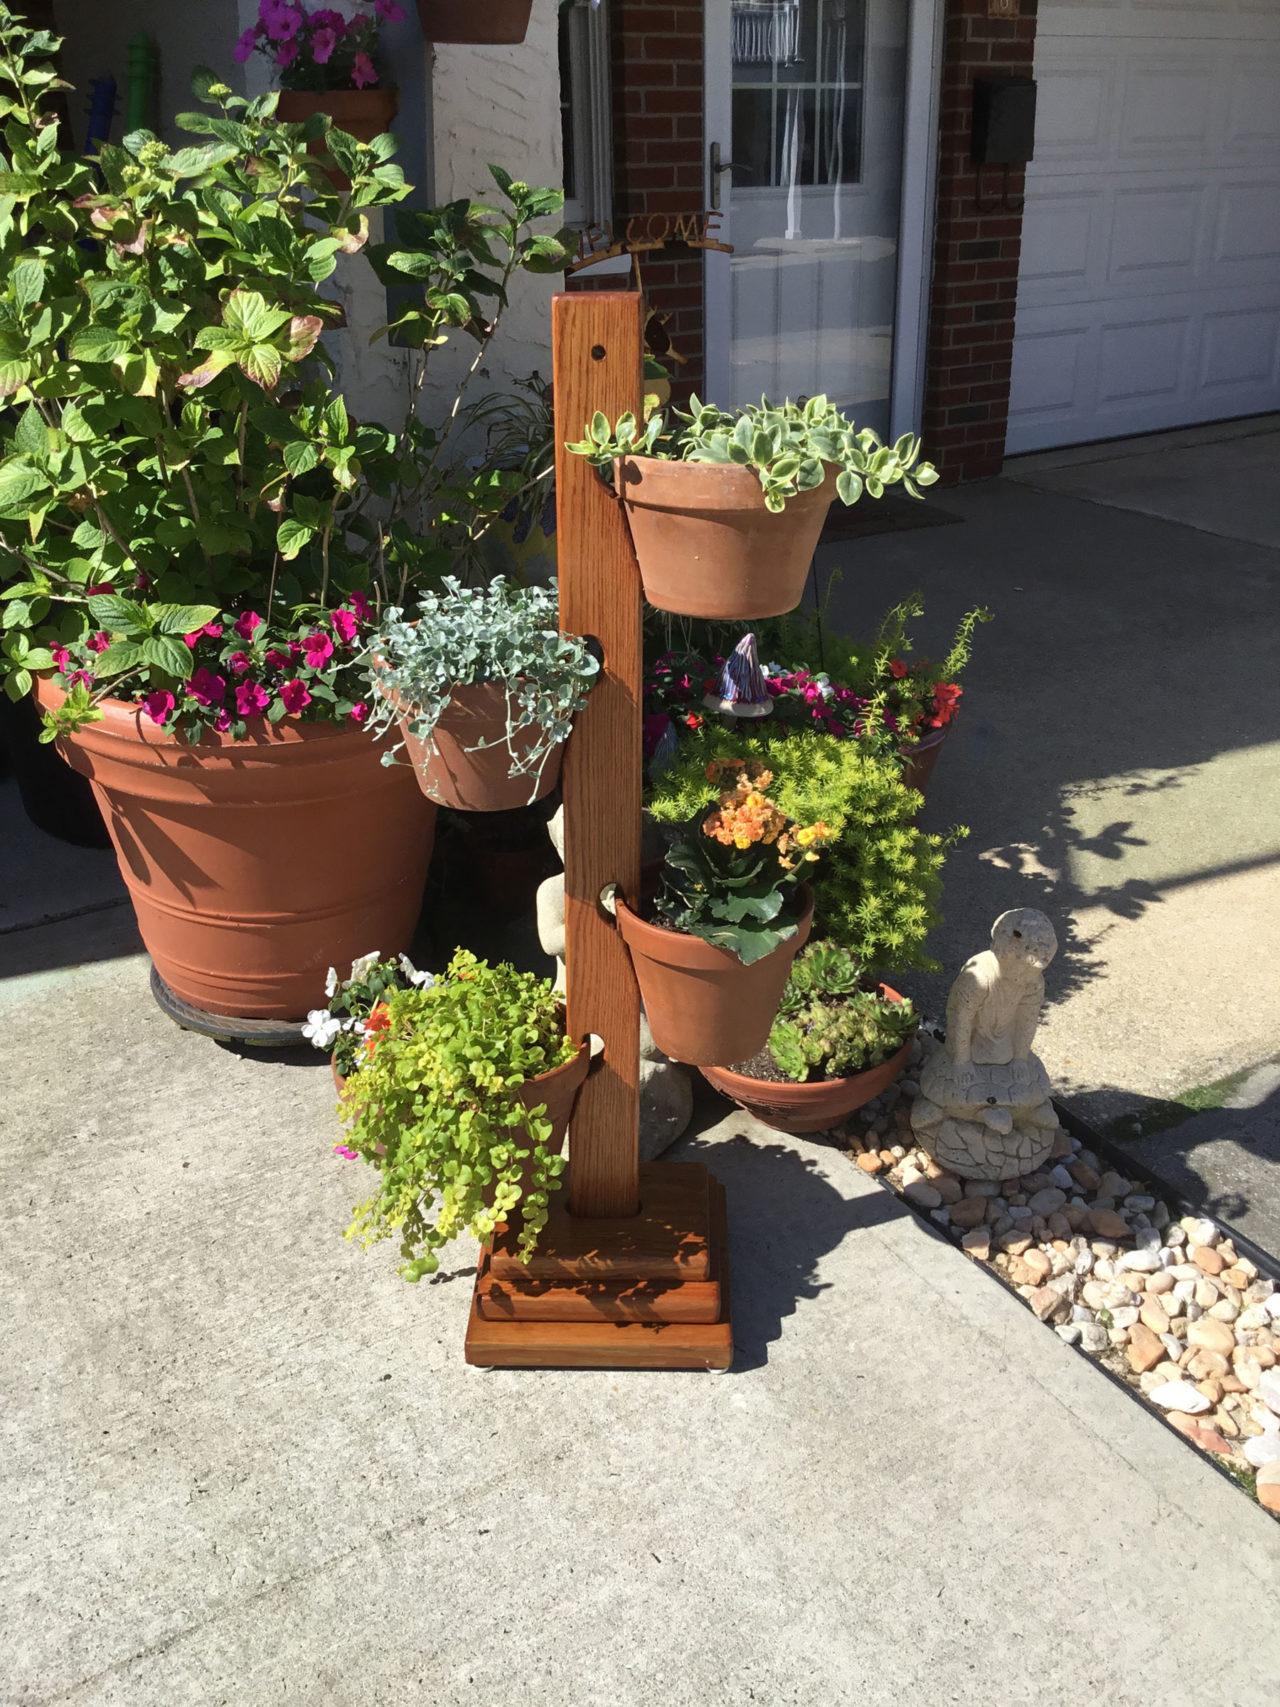 Clarizas-Clay-Pot-Swings-1